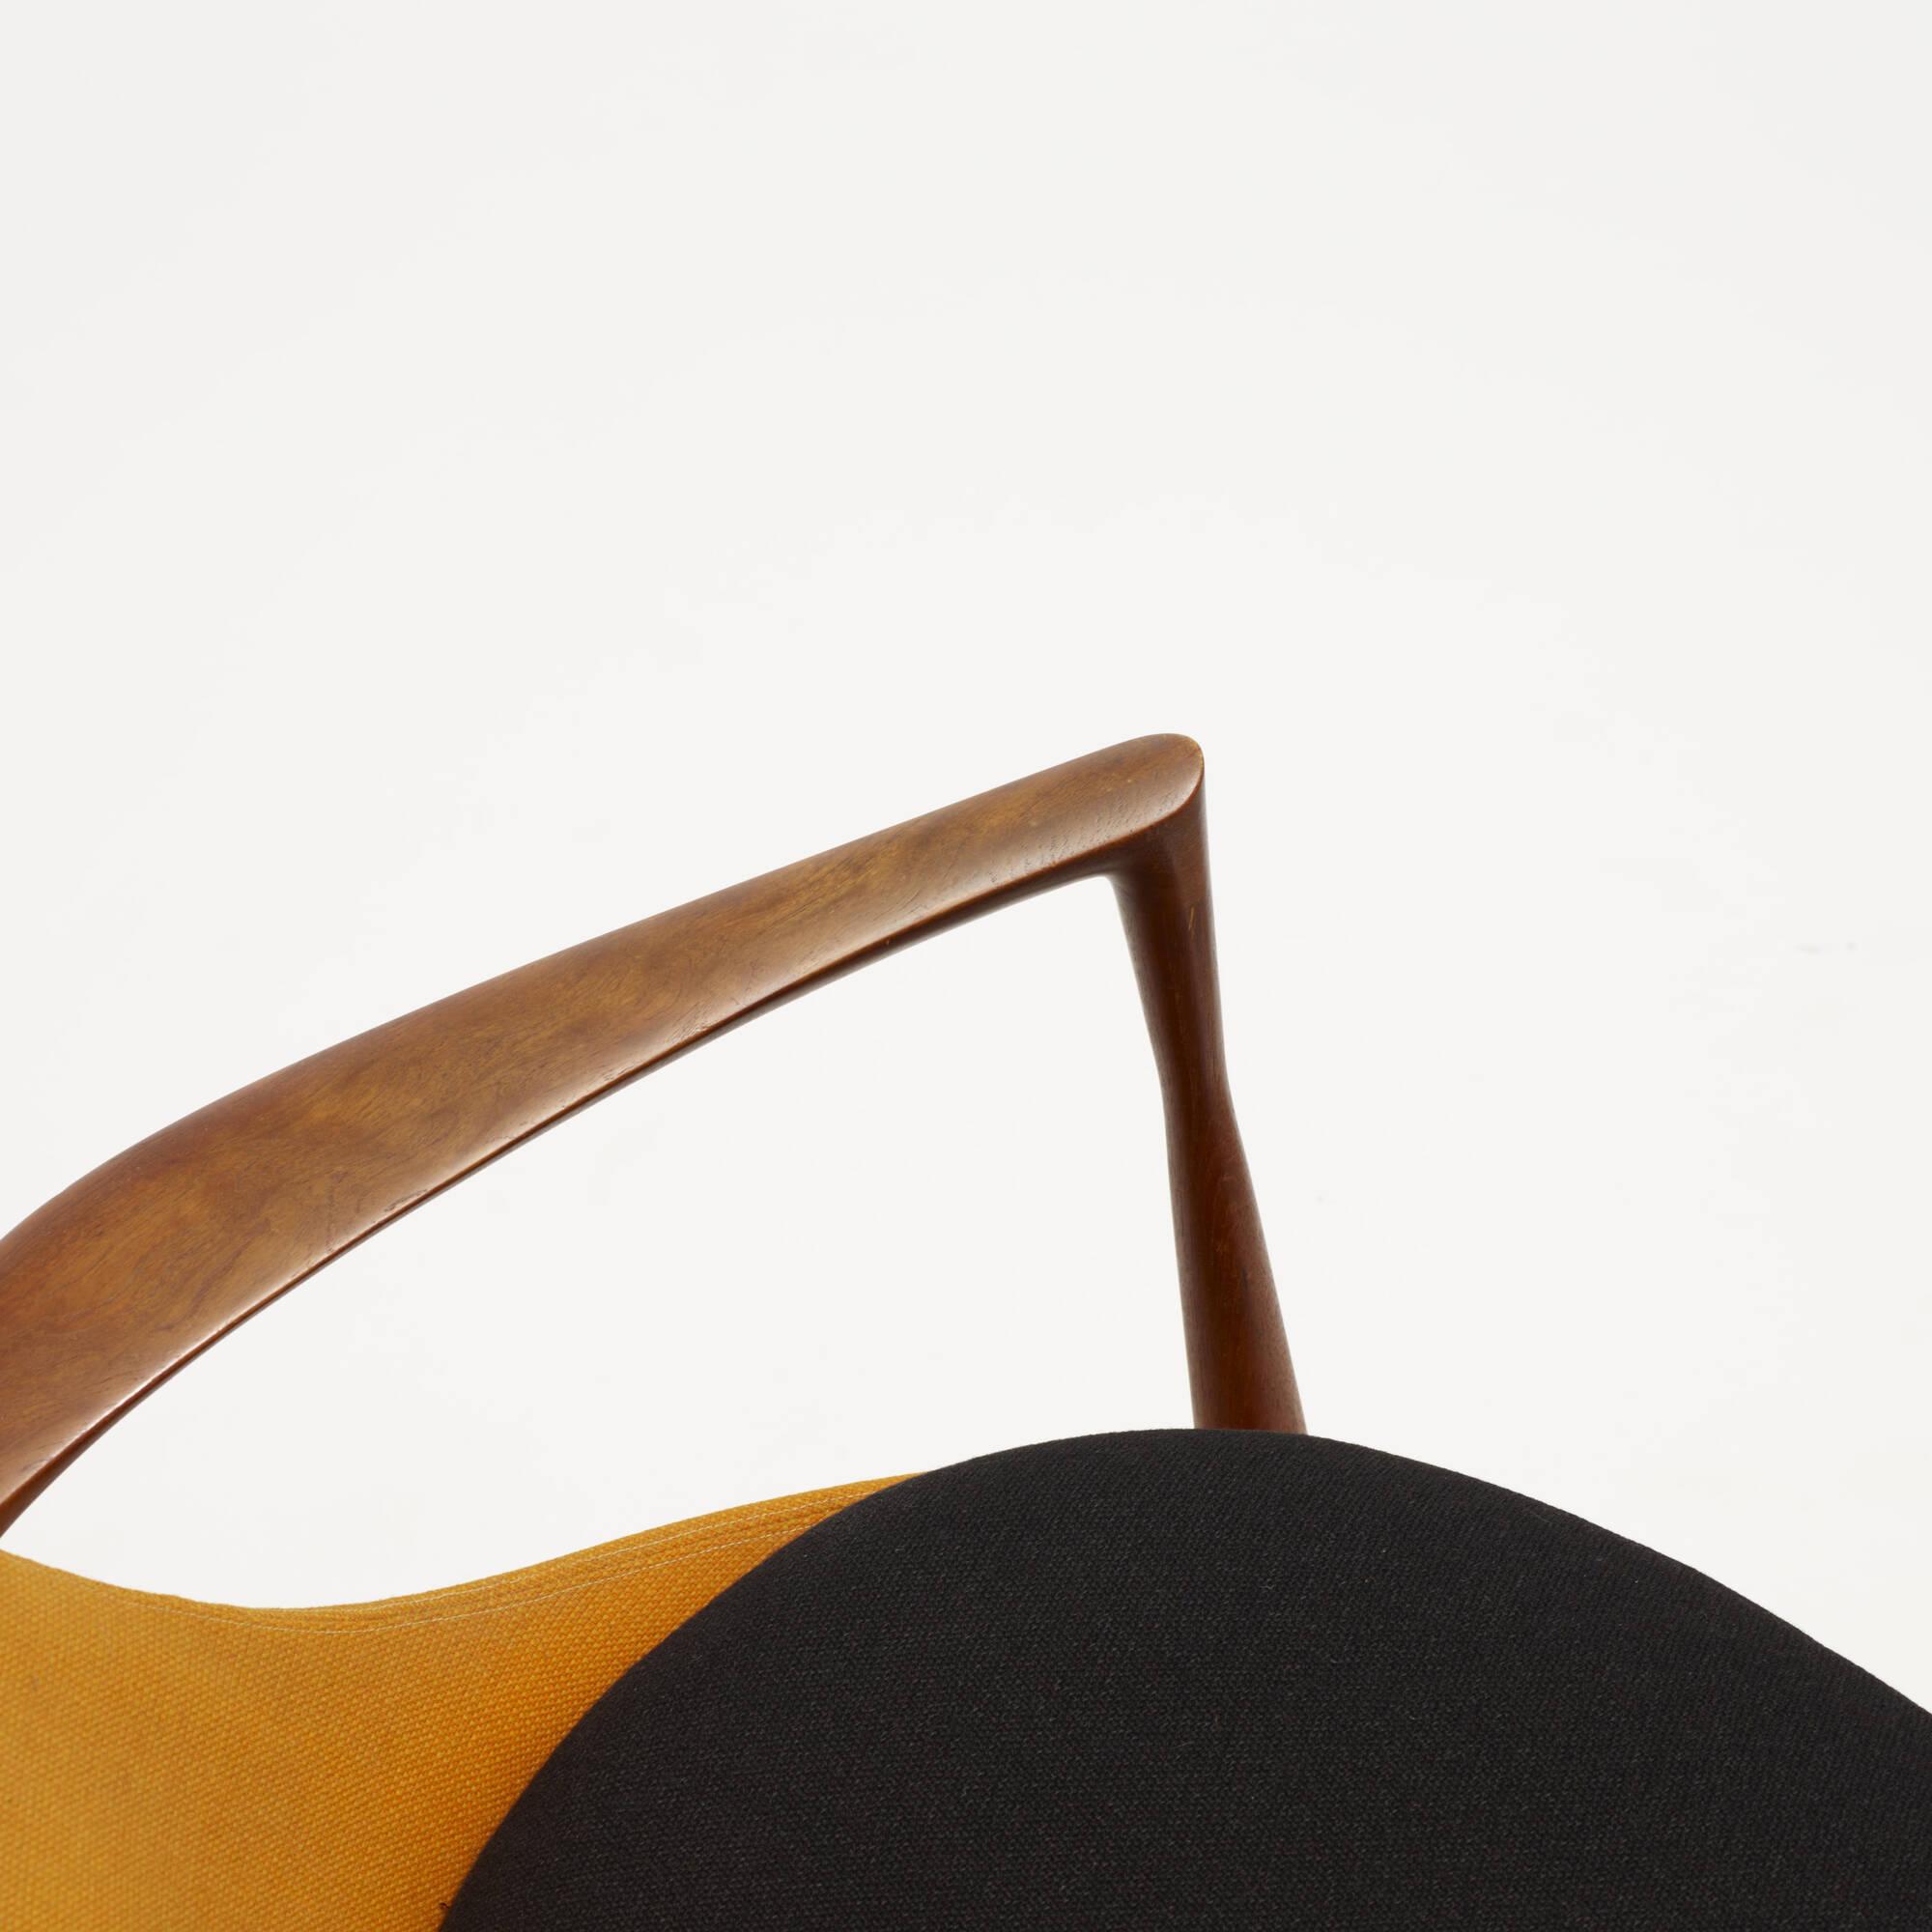 318: Ib Kofod-Larsen / Elizabeth chairs, pair (3 of 4)